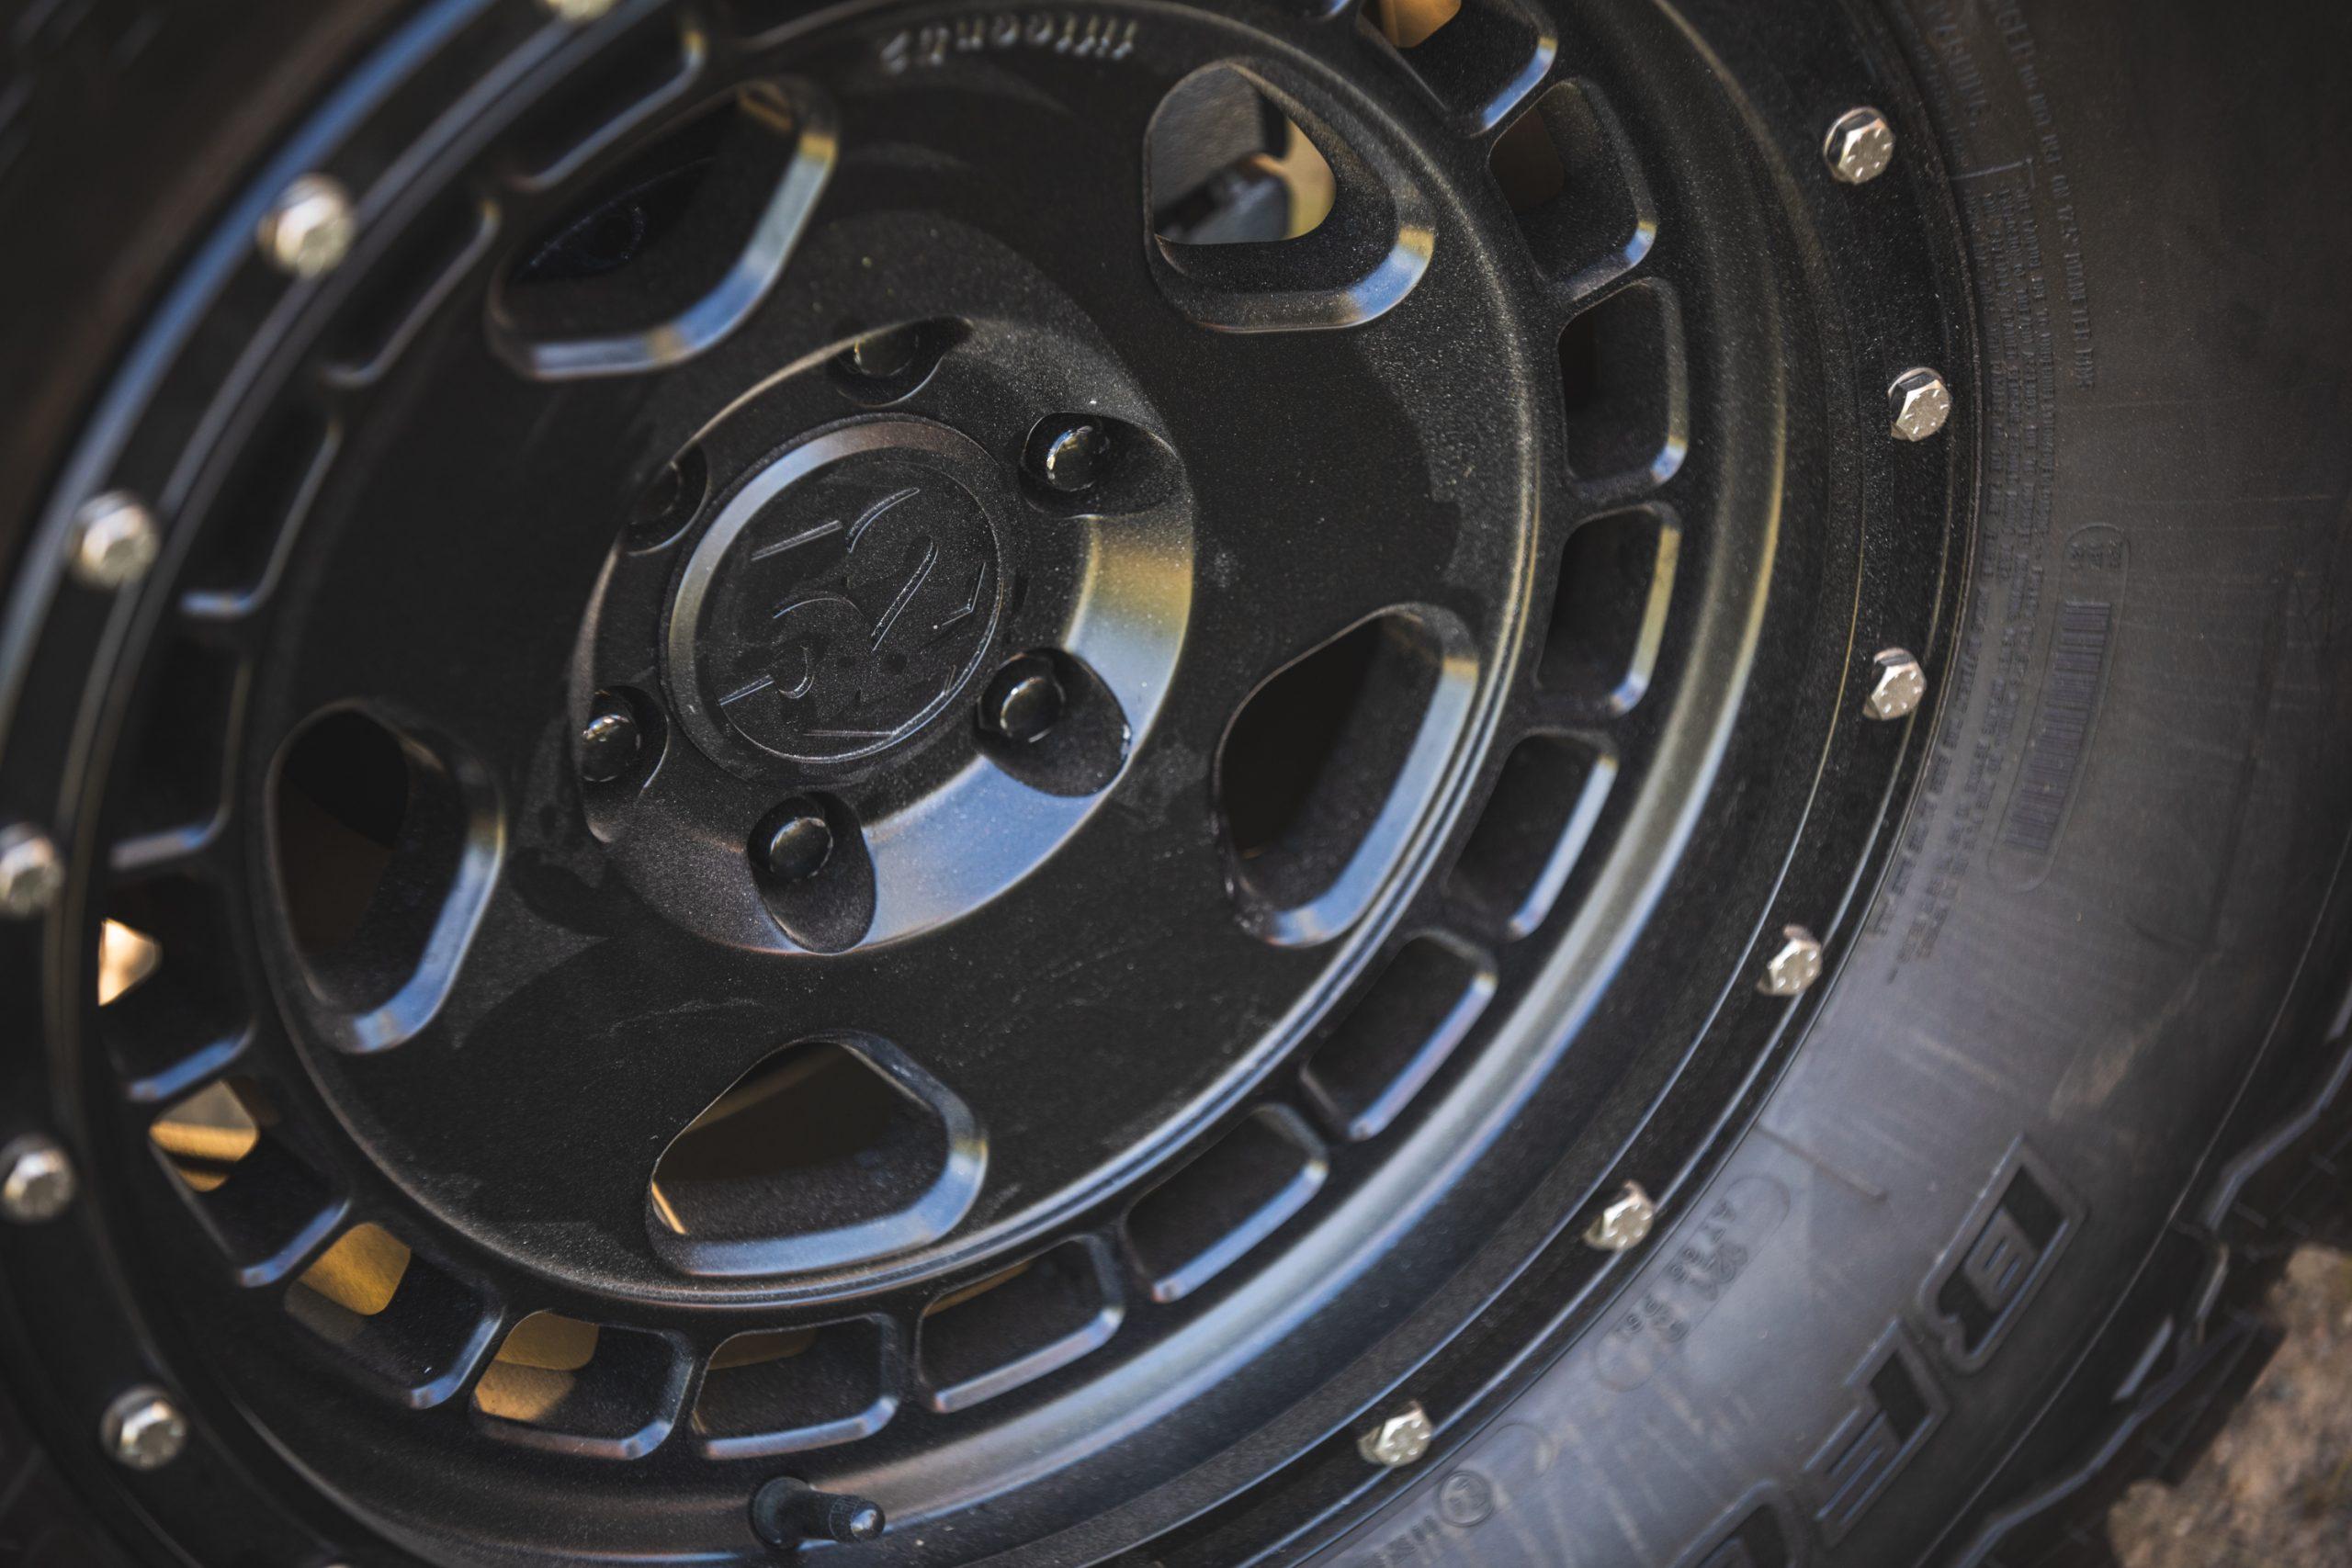 2021 Ford Bronco Method Wheel BFG Tire